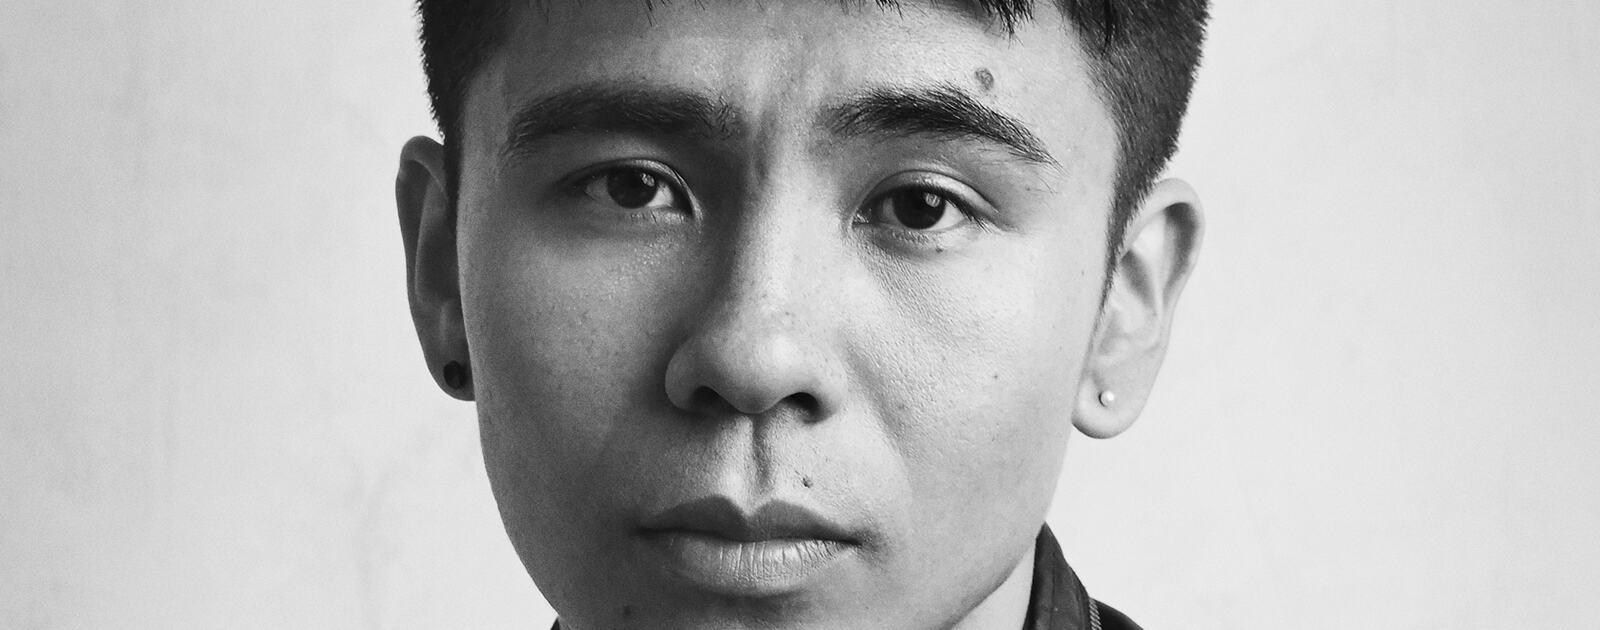 Headshot of Ocean Vuong, American poet